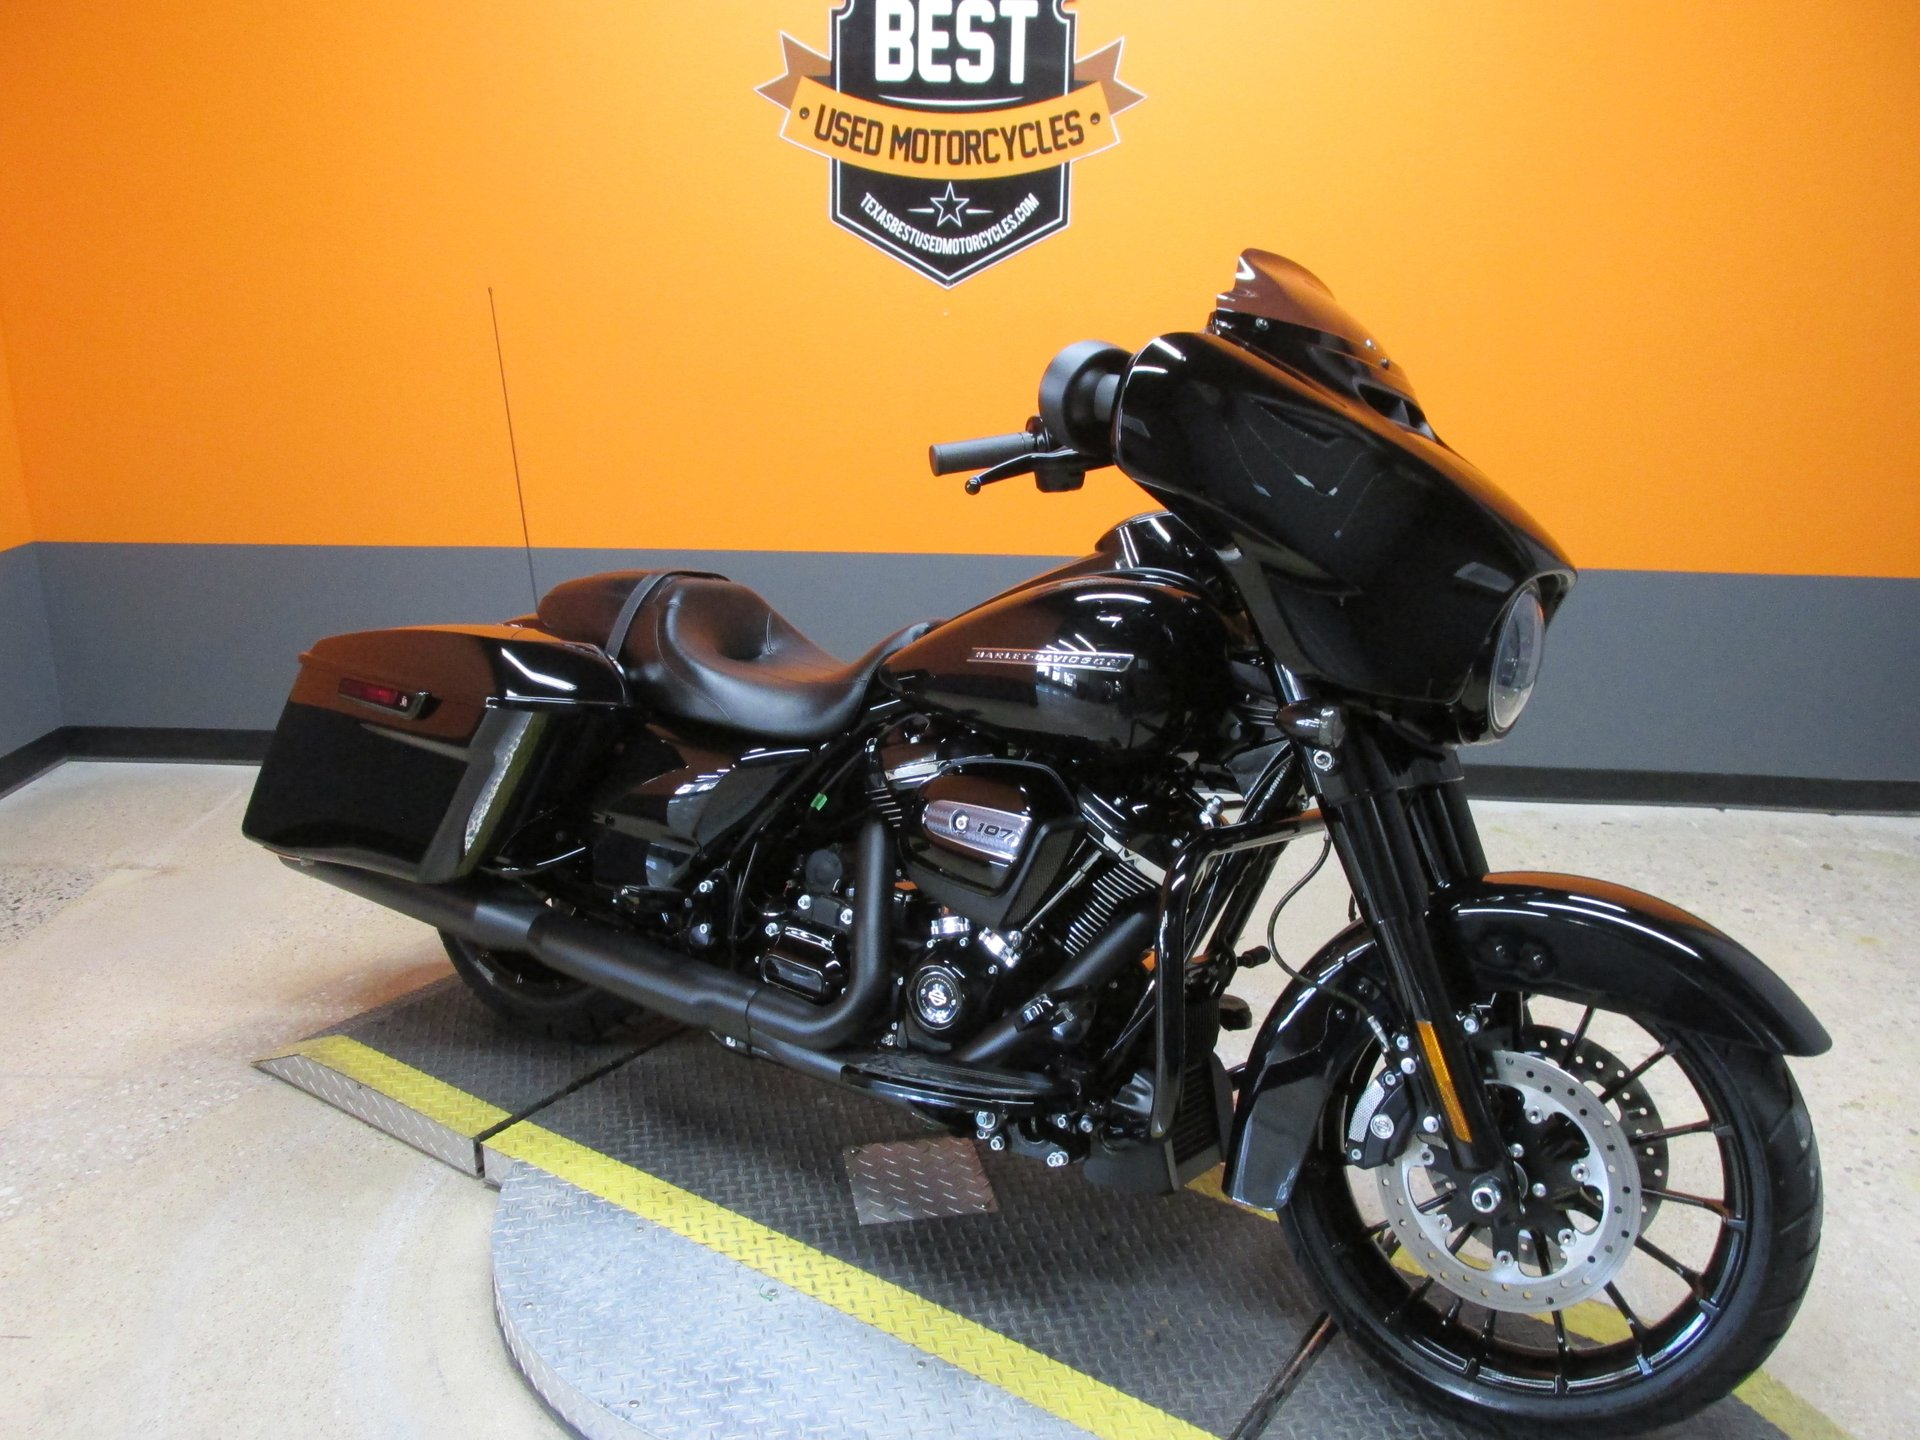 2018 Harley-Davidson Street Glide | Berlin Motors